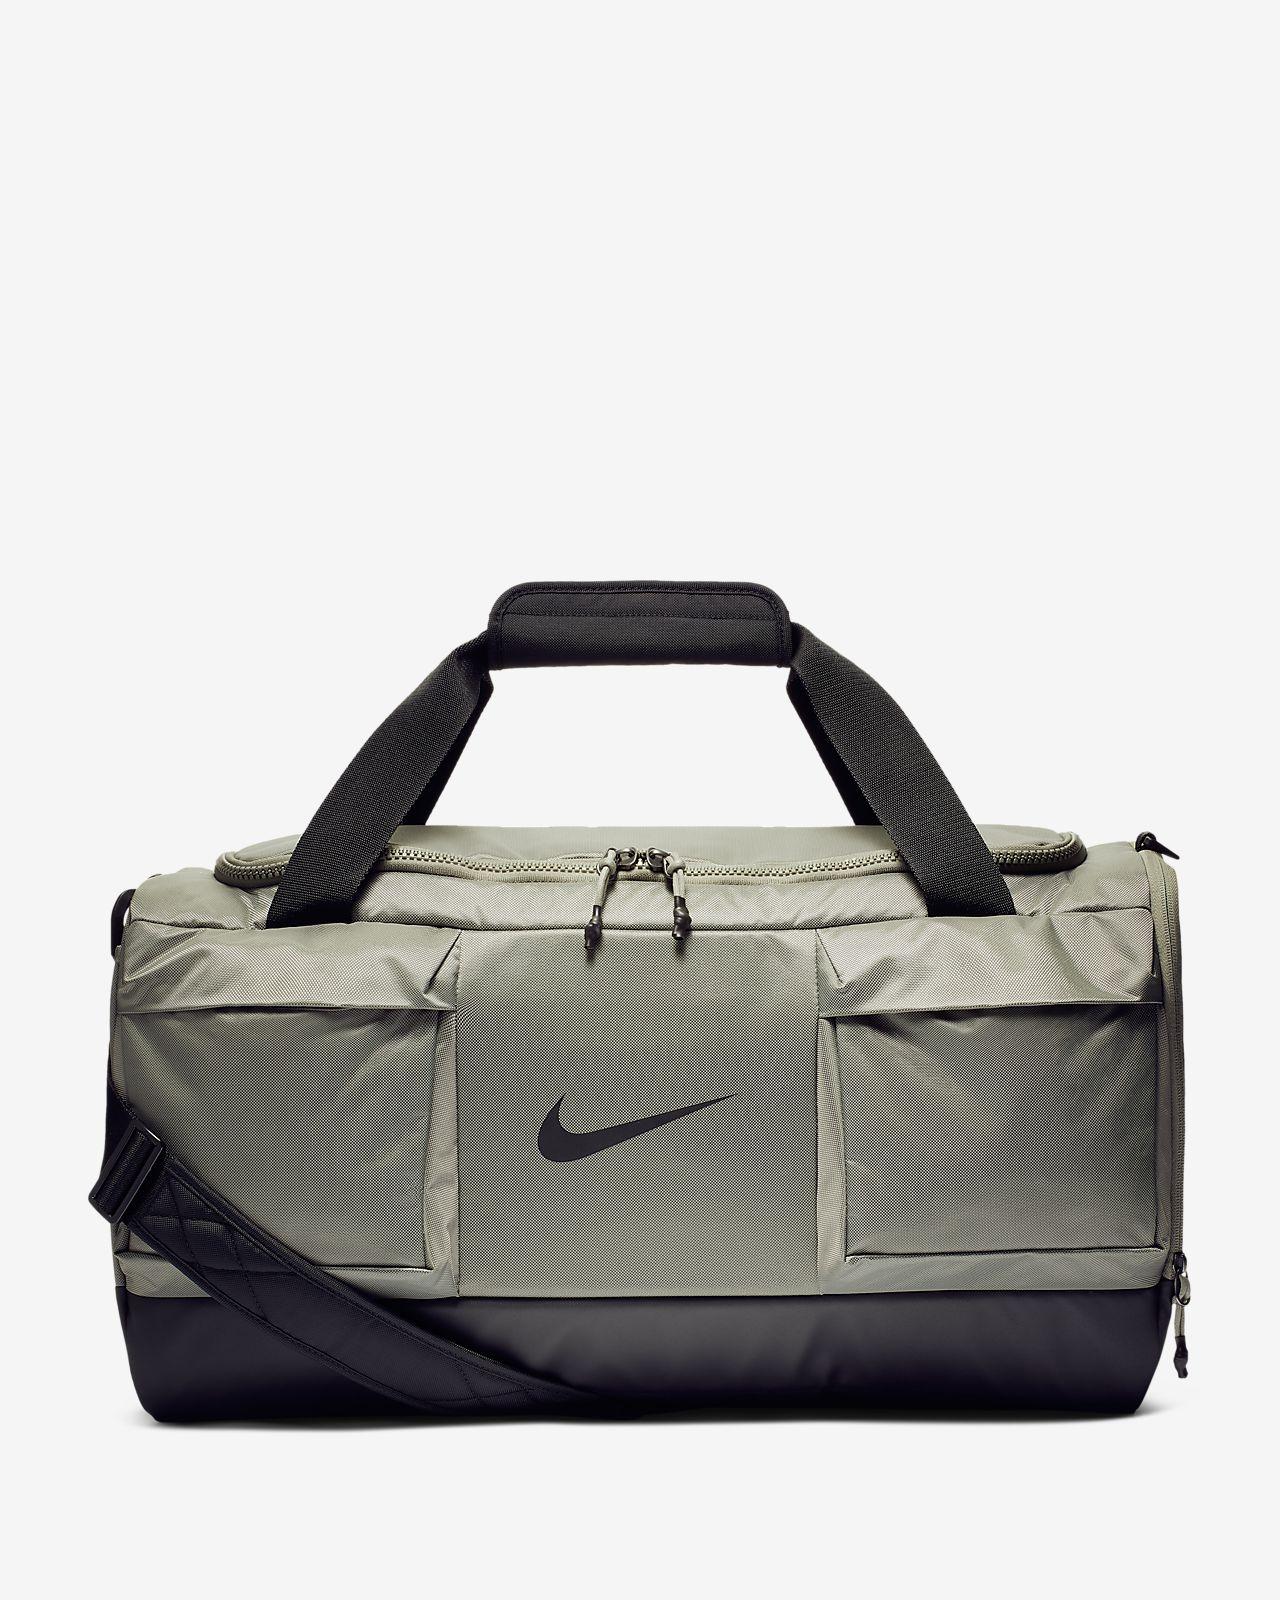 Power Nike Da Training UomomedioIt Vapor Borsone mwON8n0v